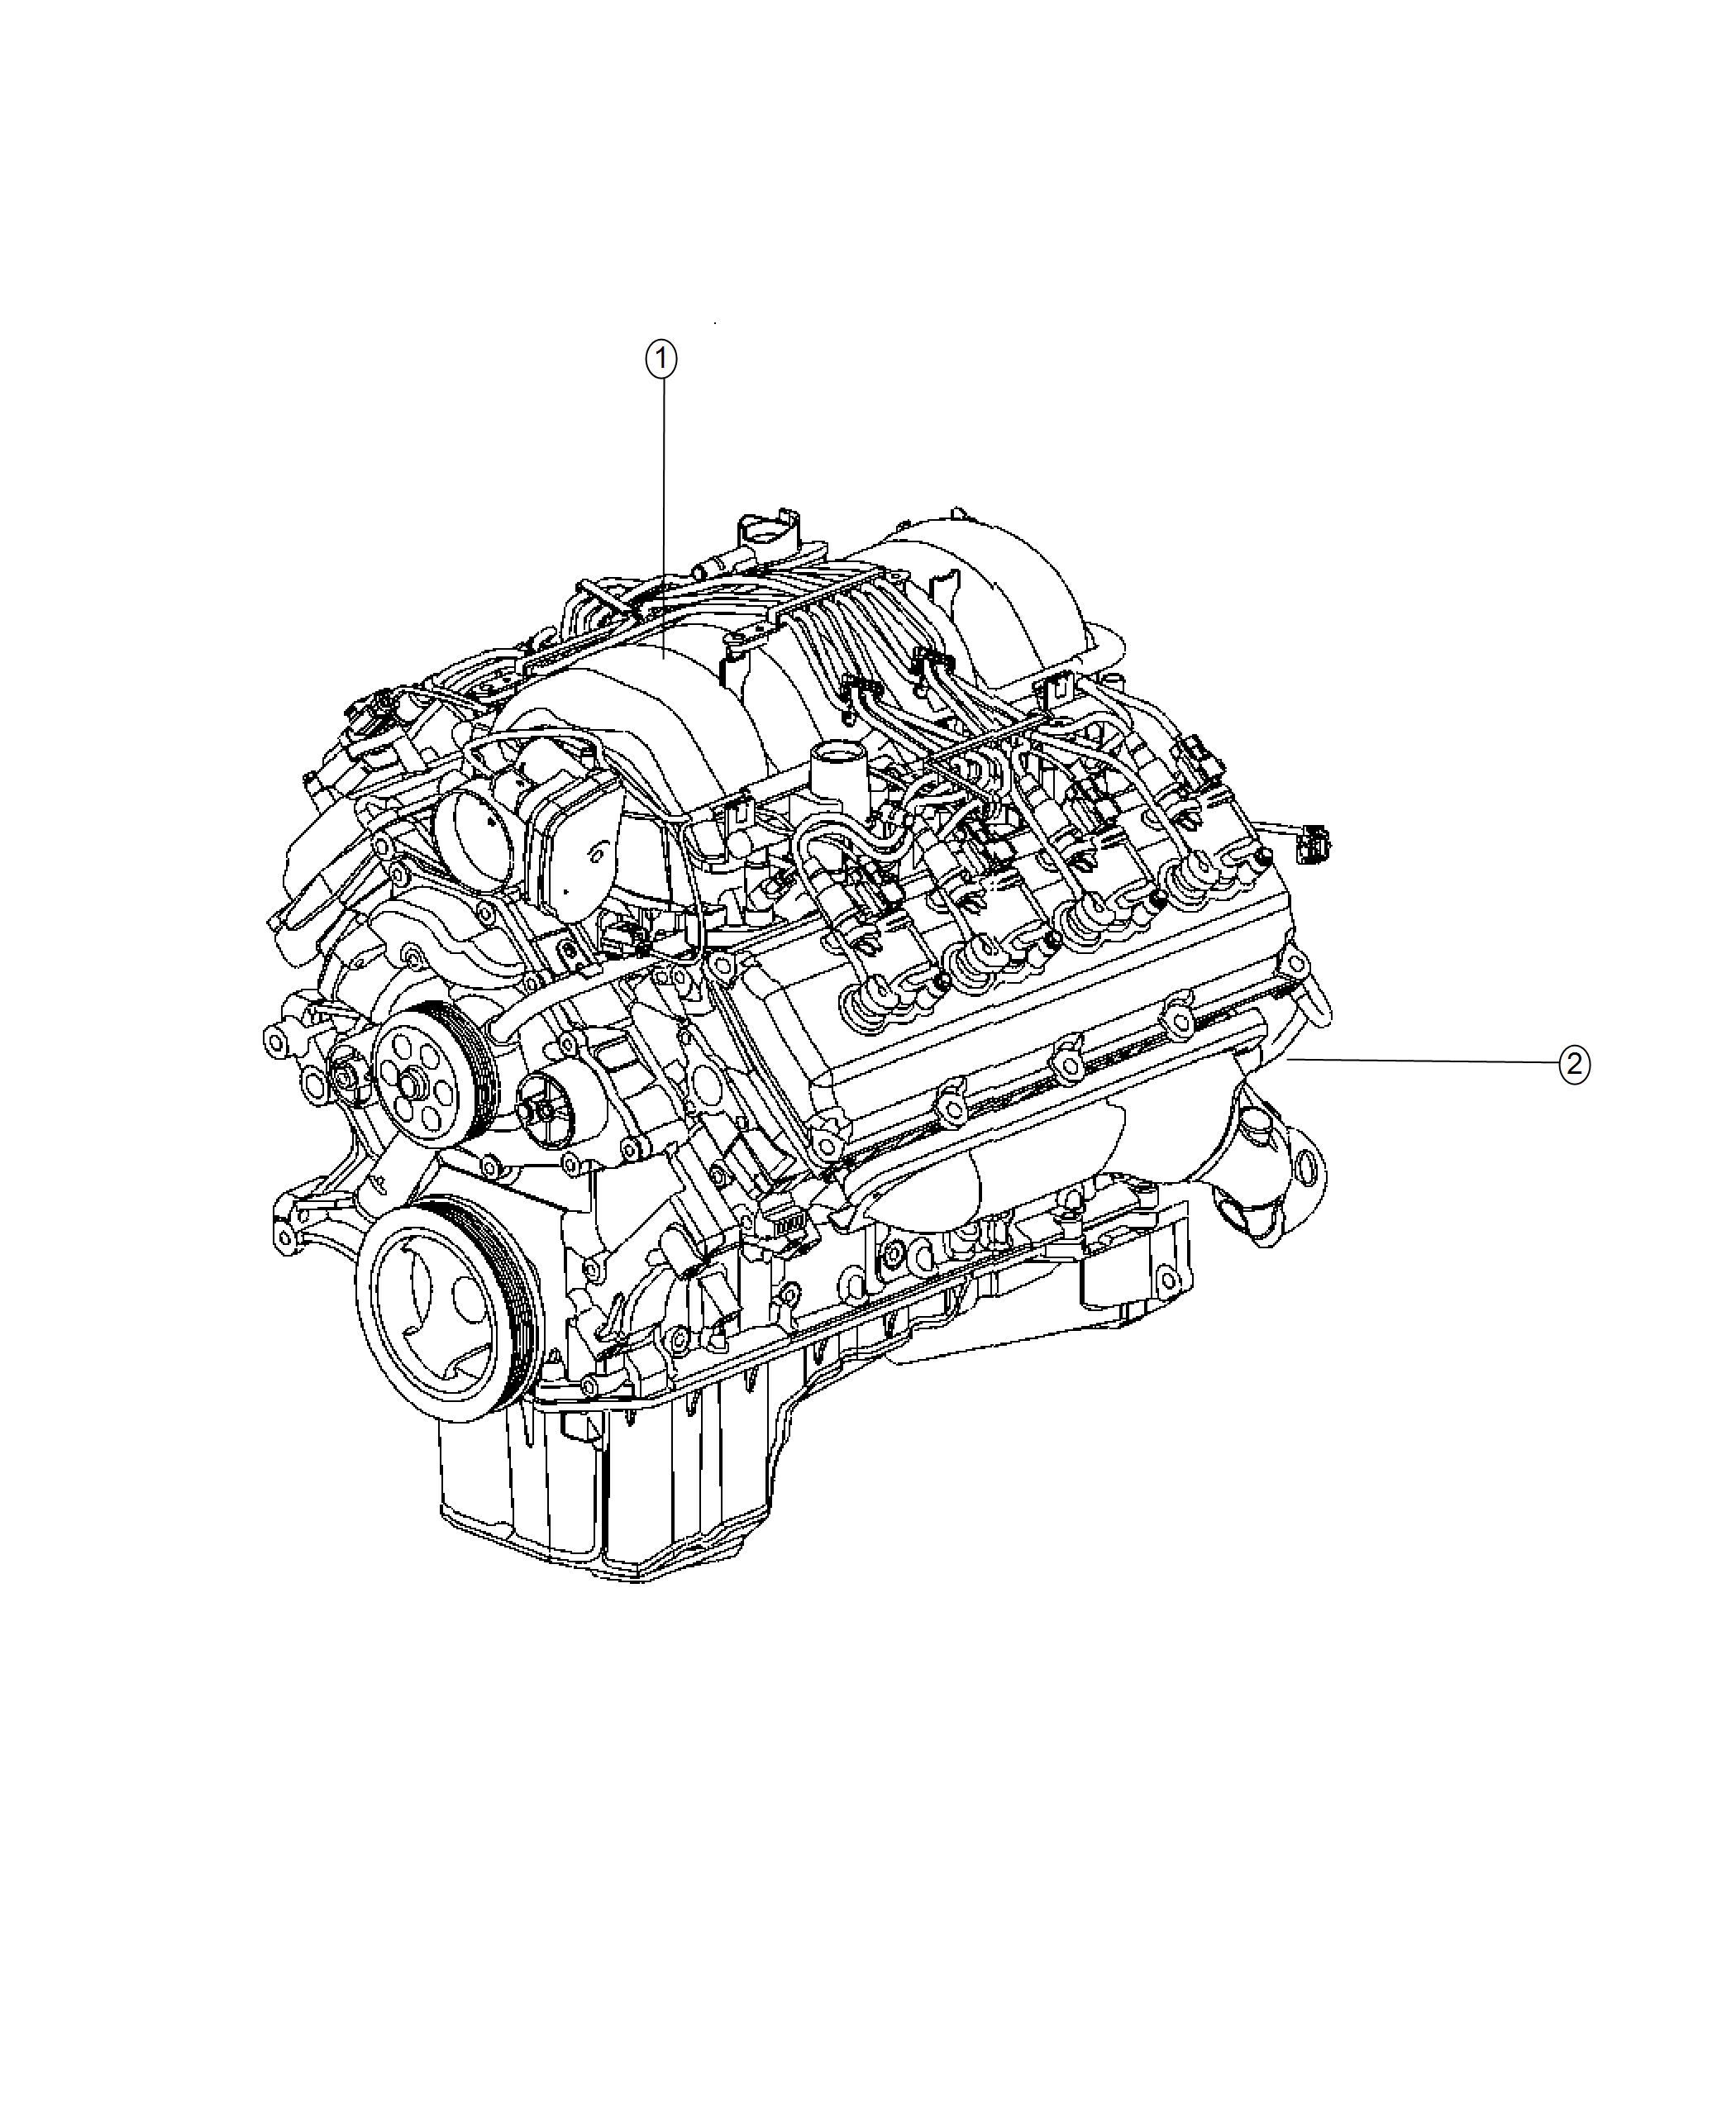 Chrysler 300 Engine Long Block Engine Oil Cooler